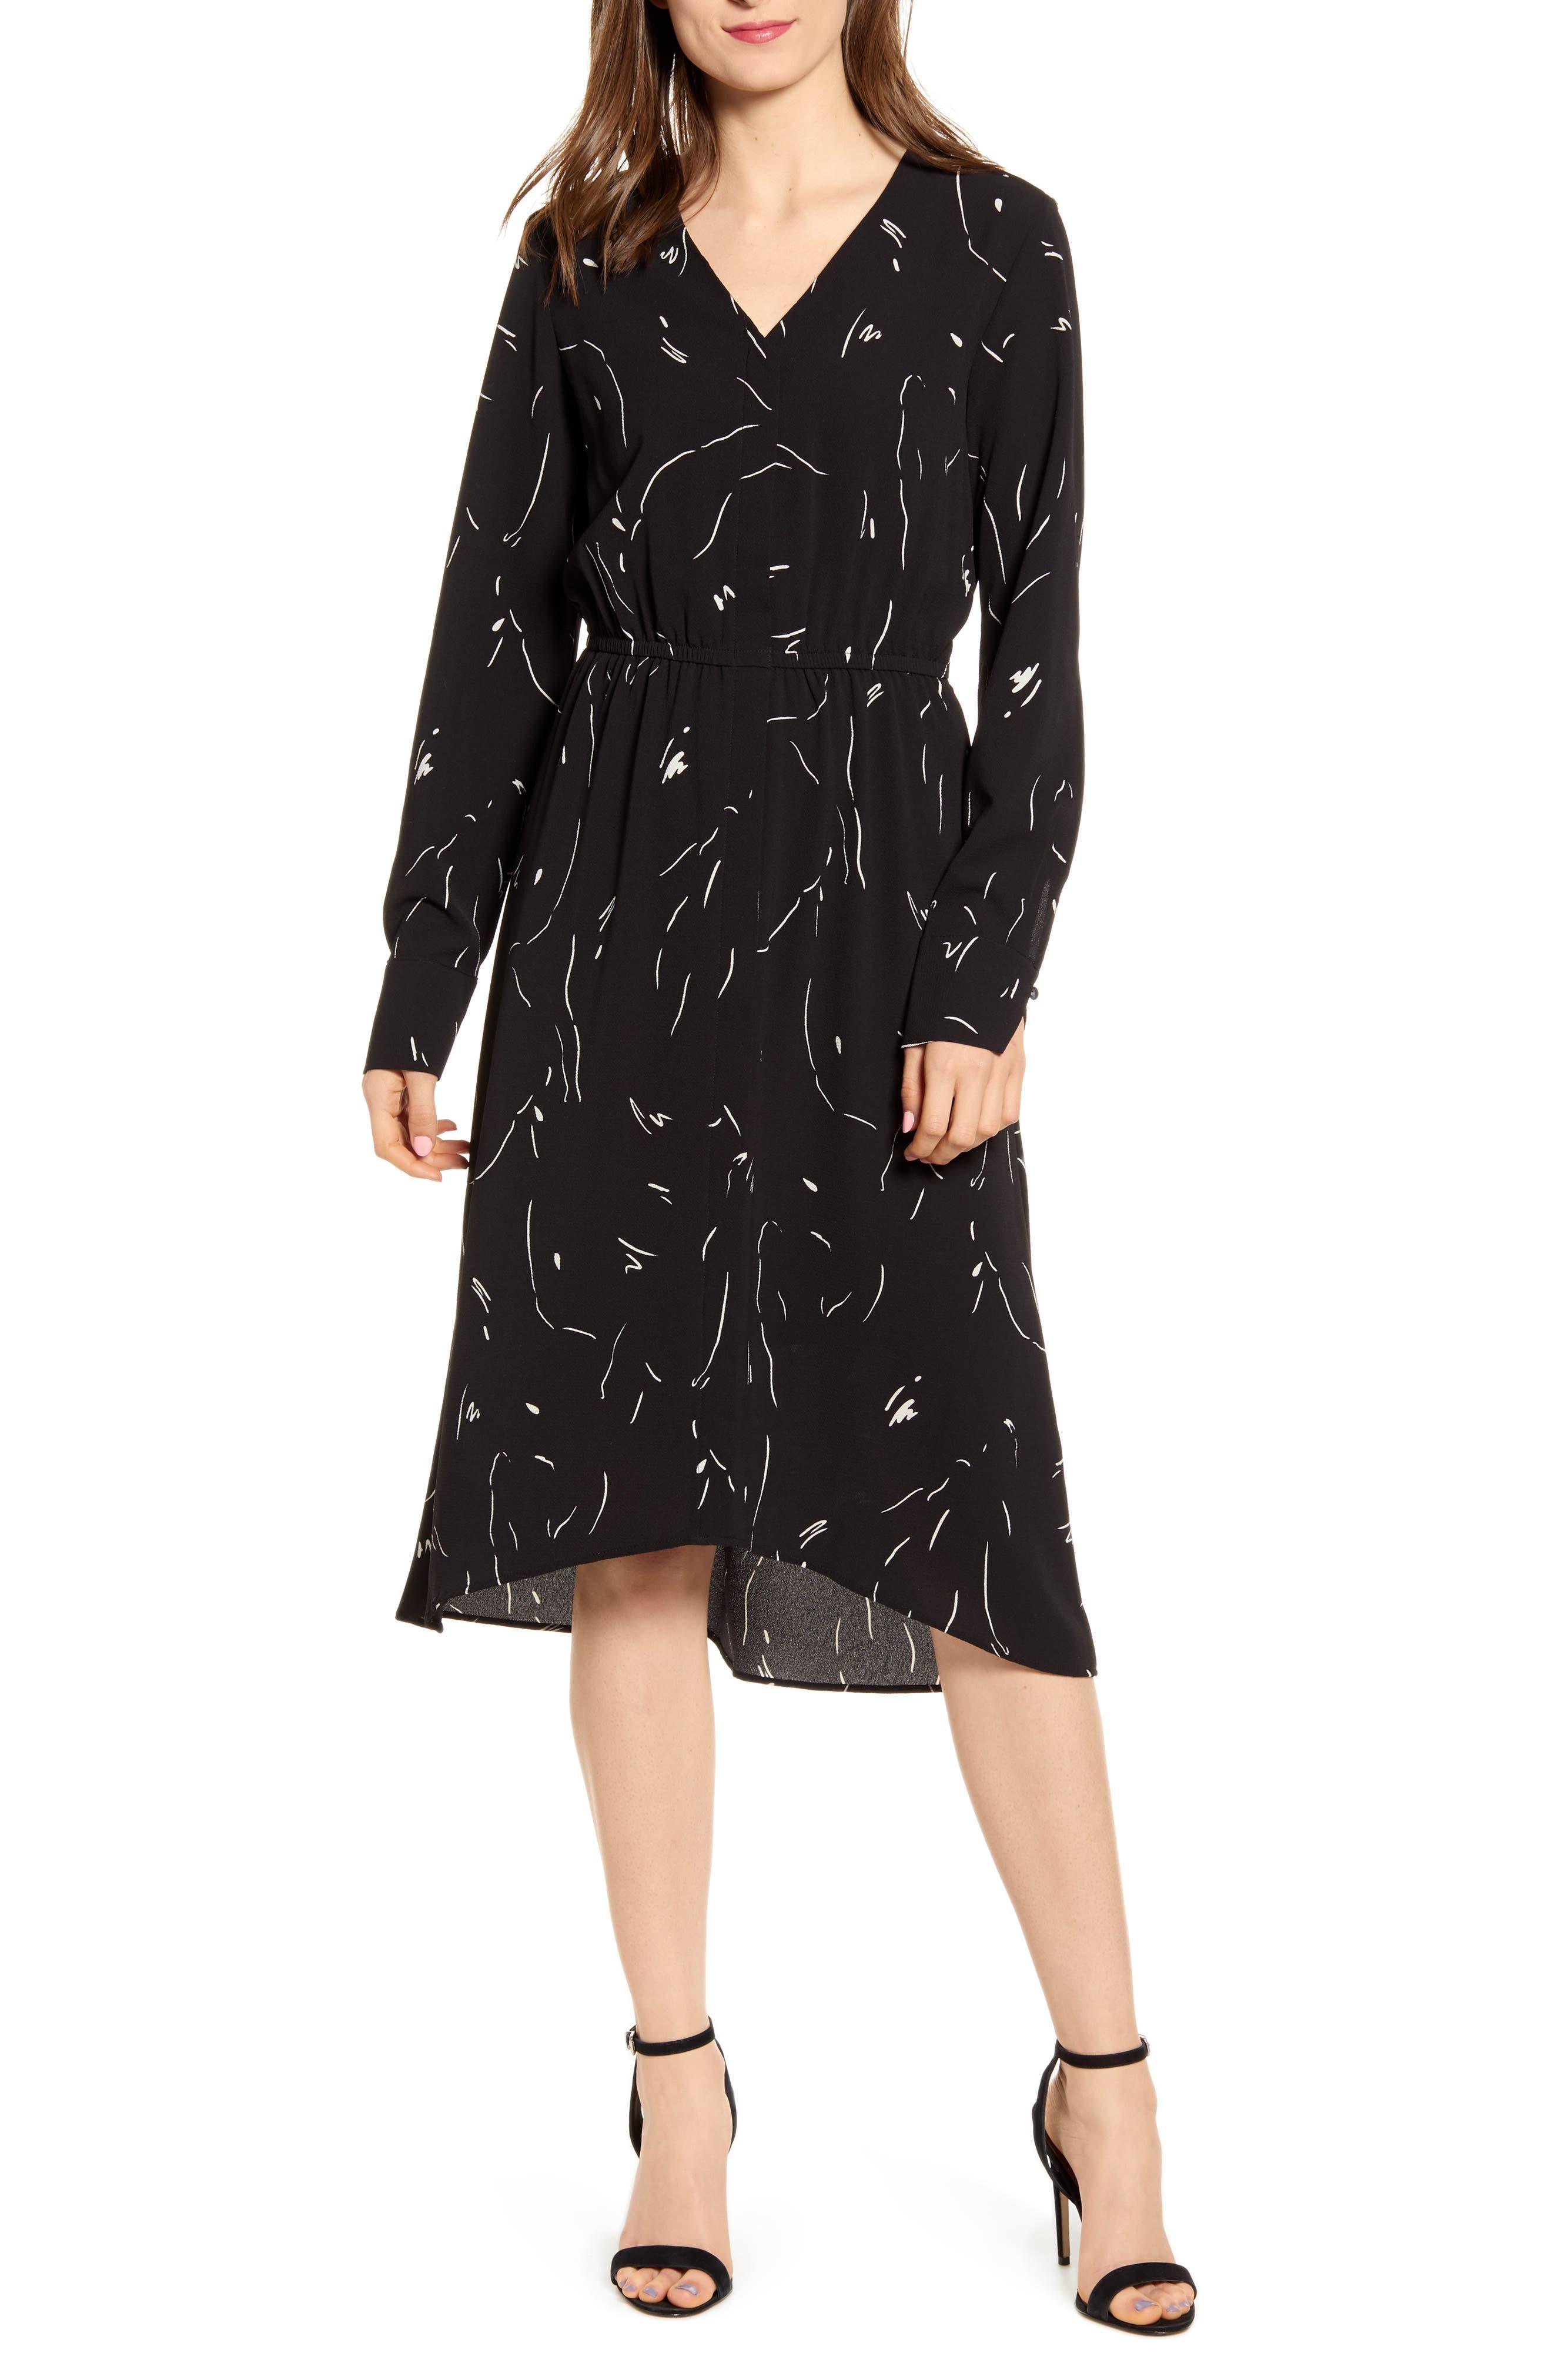 Vero Moda Gianna Midi Dress, Black